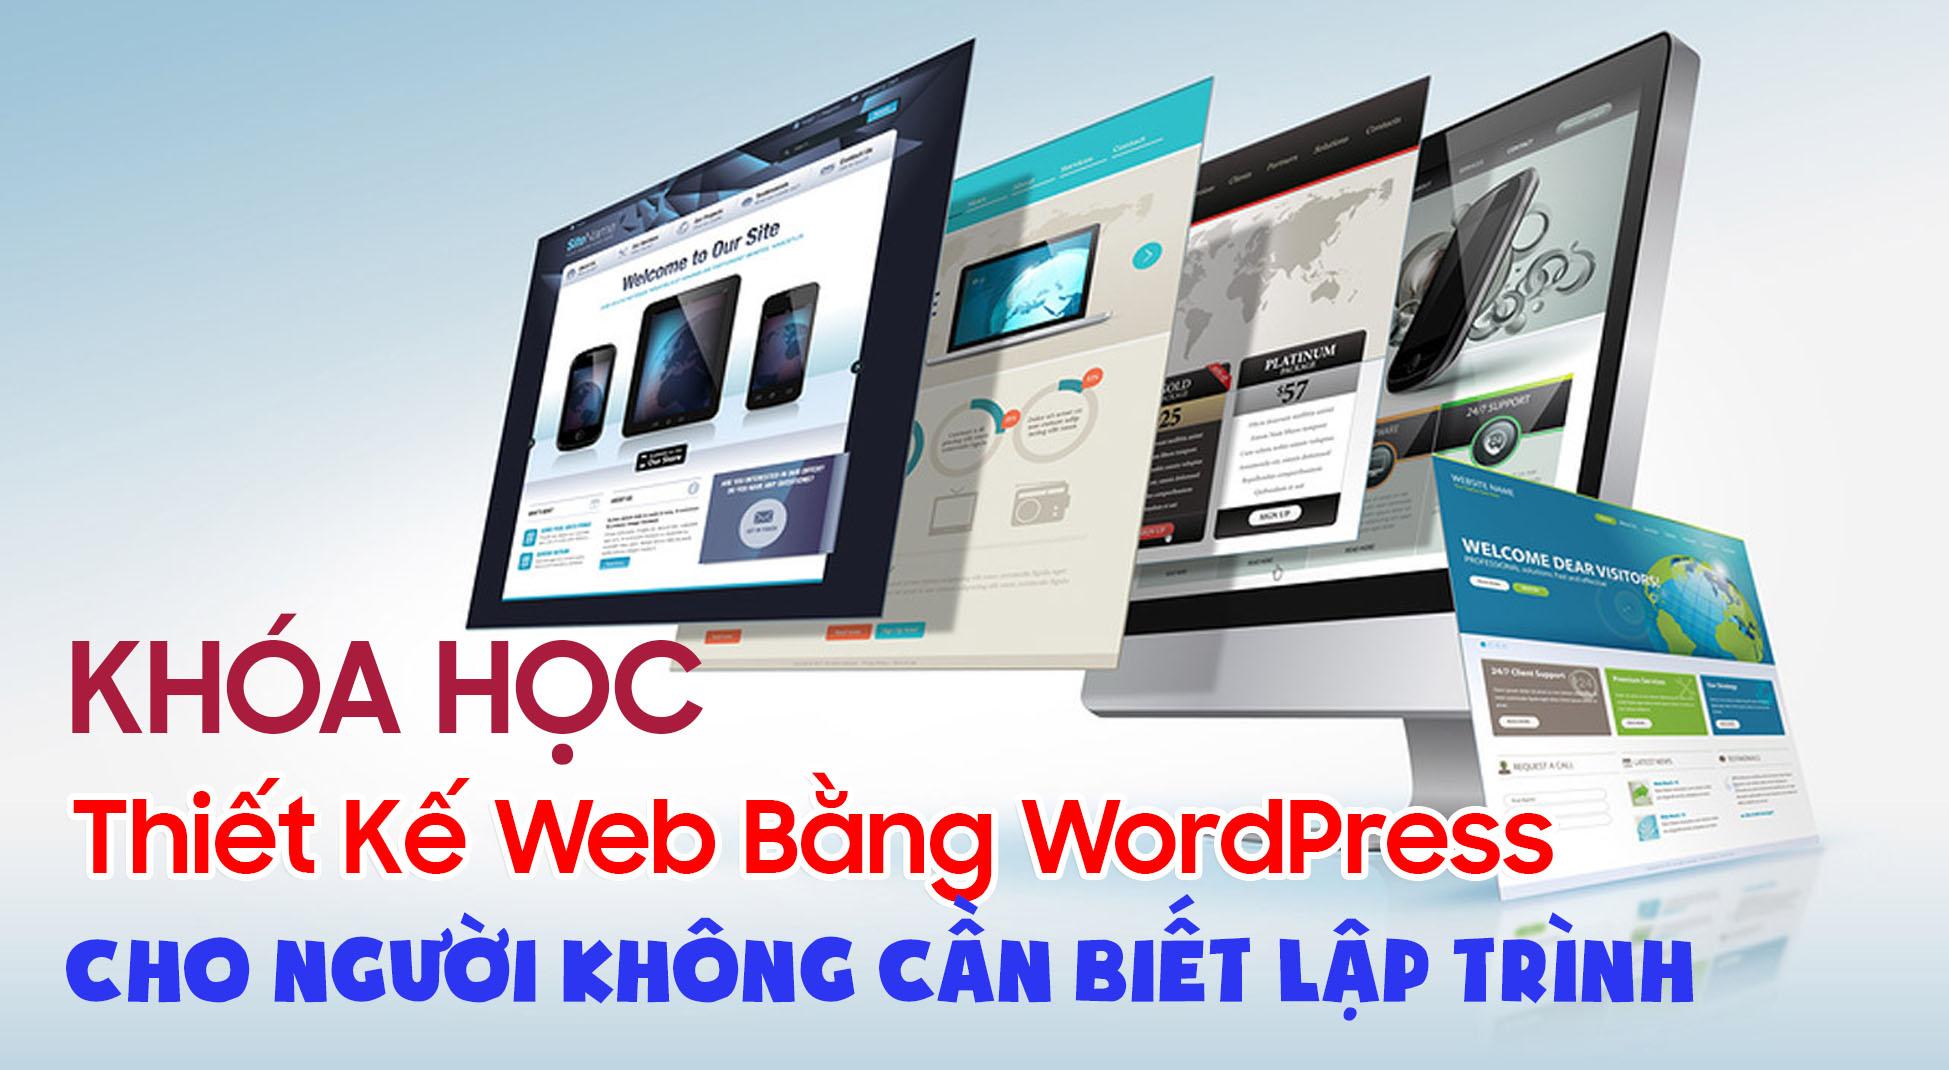 khoa-hoc-thiet-ke-web-cho-nguoi-khong-biet-lap-trinh